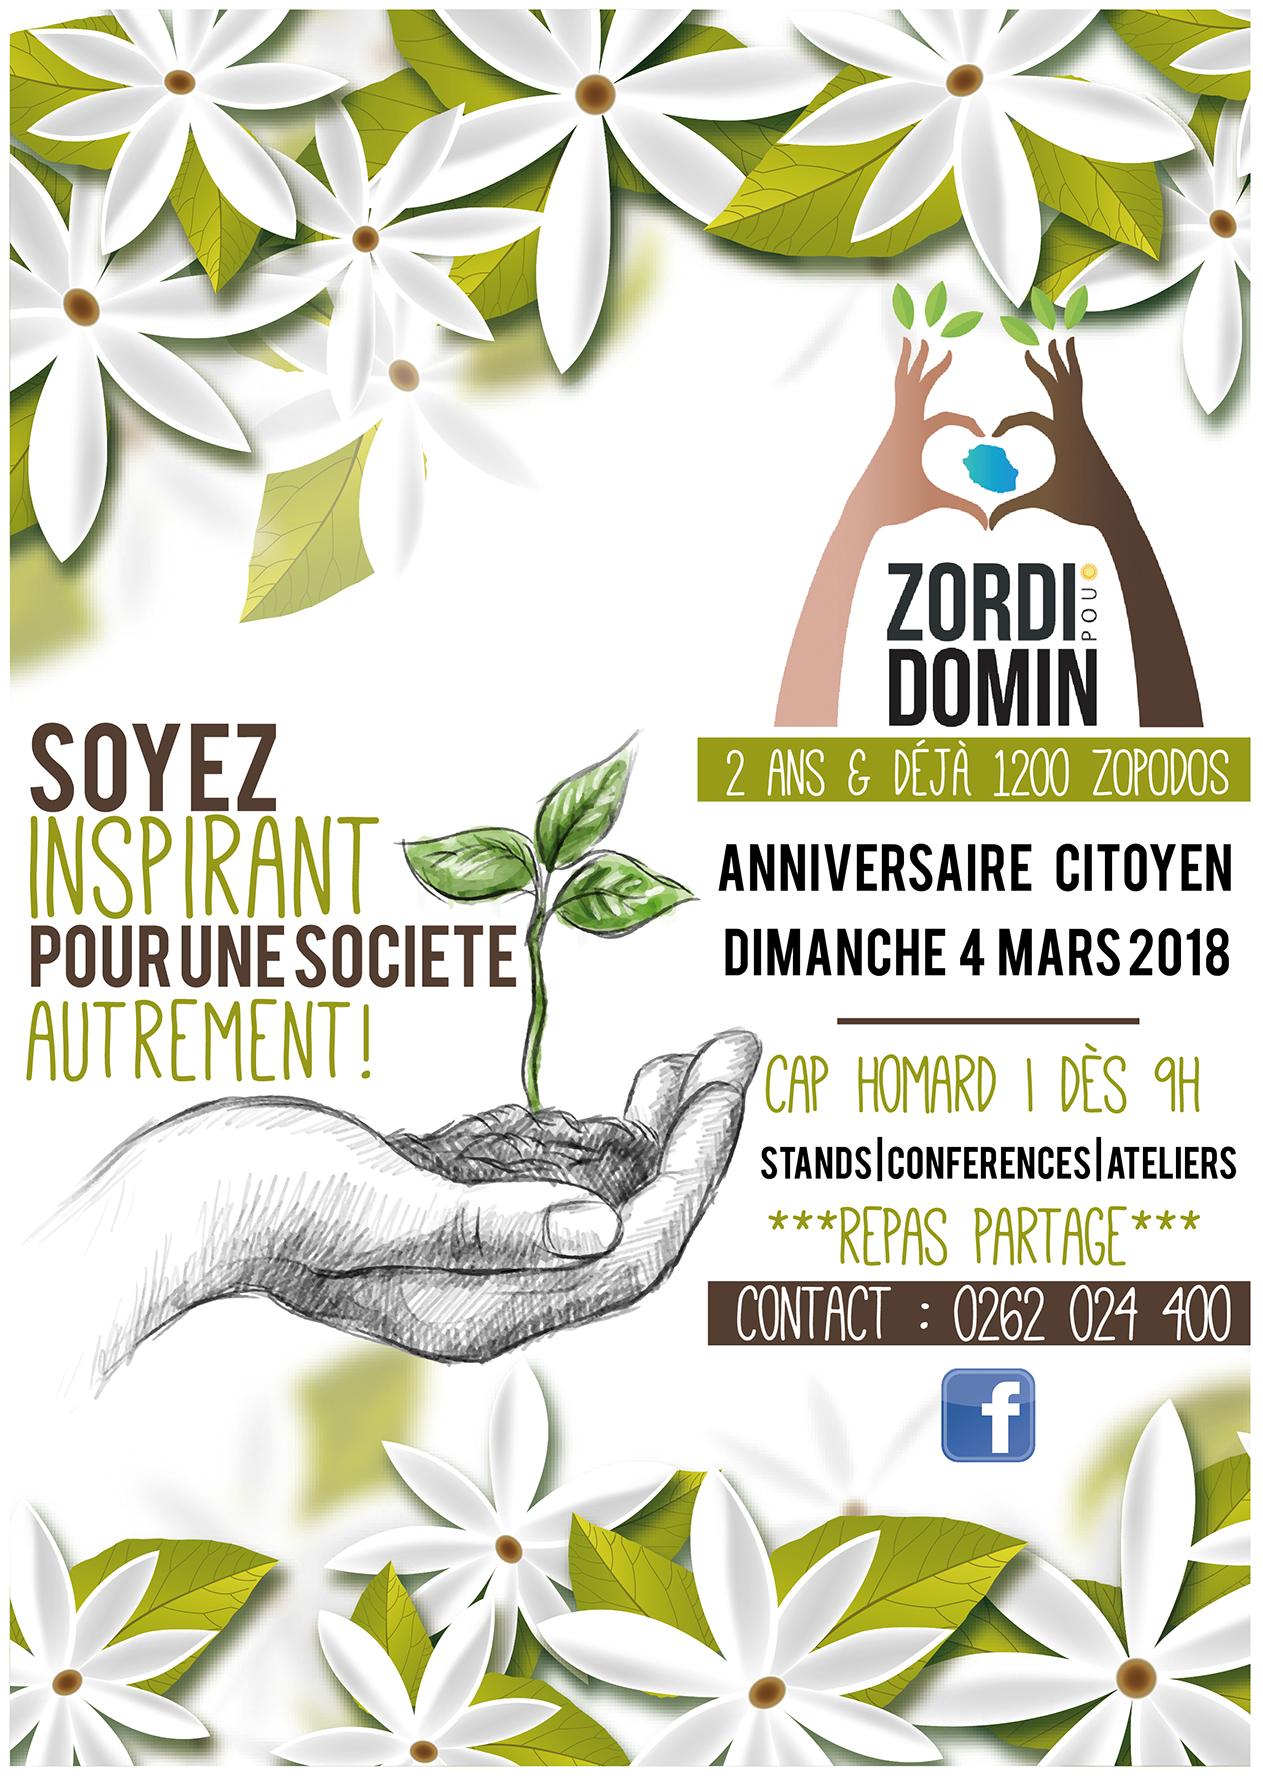 Zordi pou Domin | PAO | Affiche